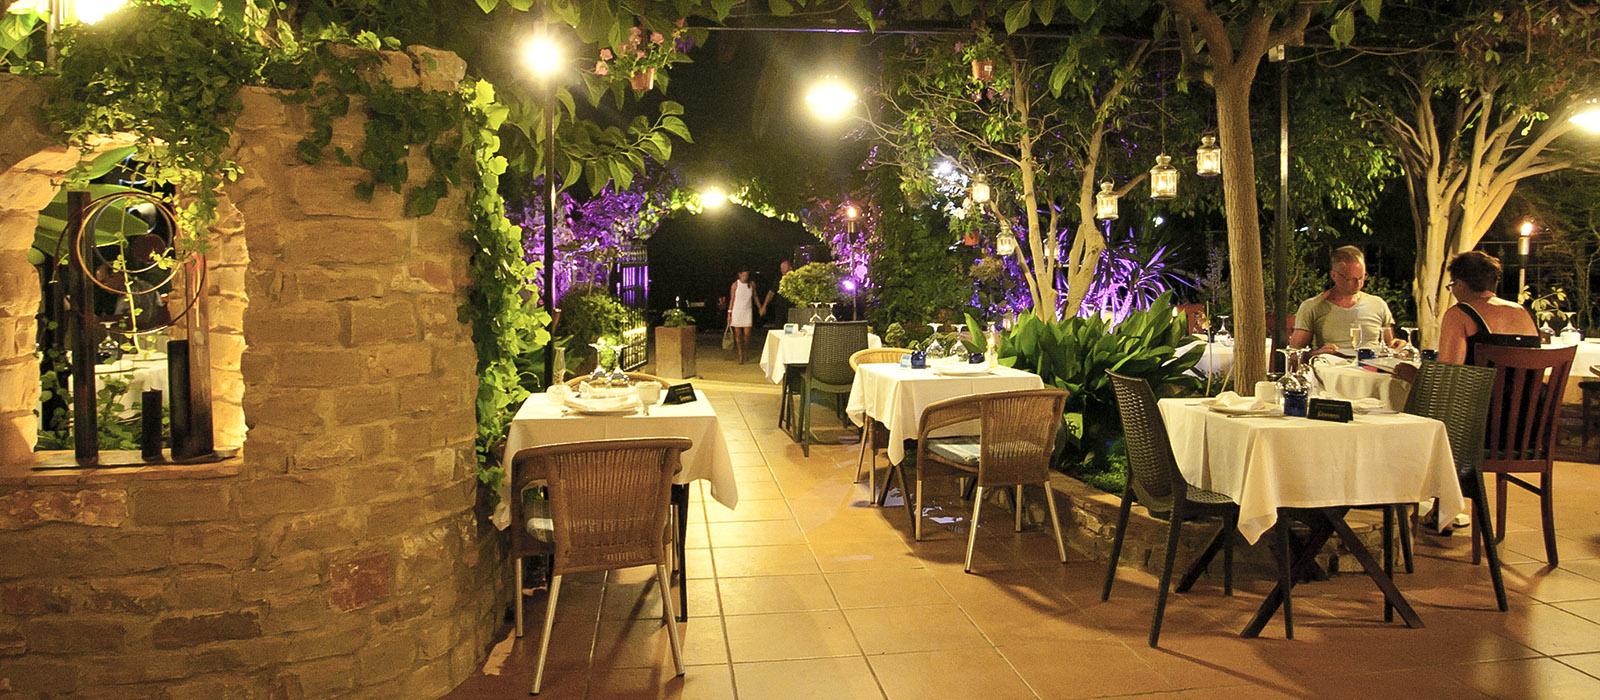 can_roig_restaurant_alcossebre